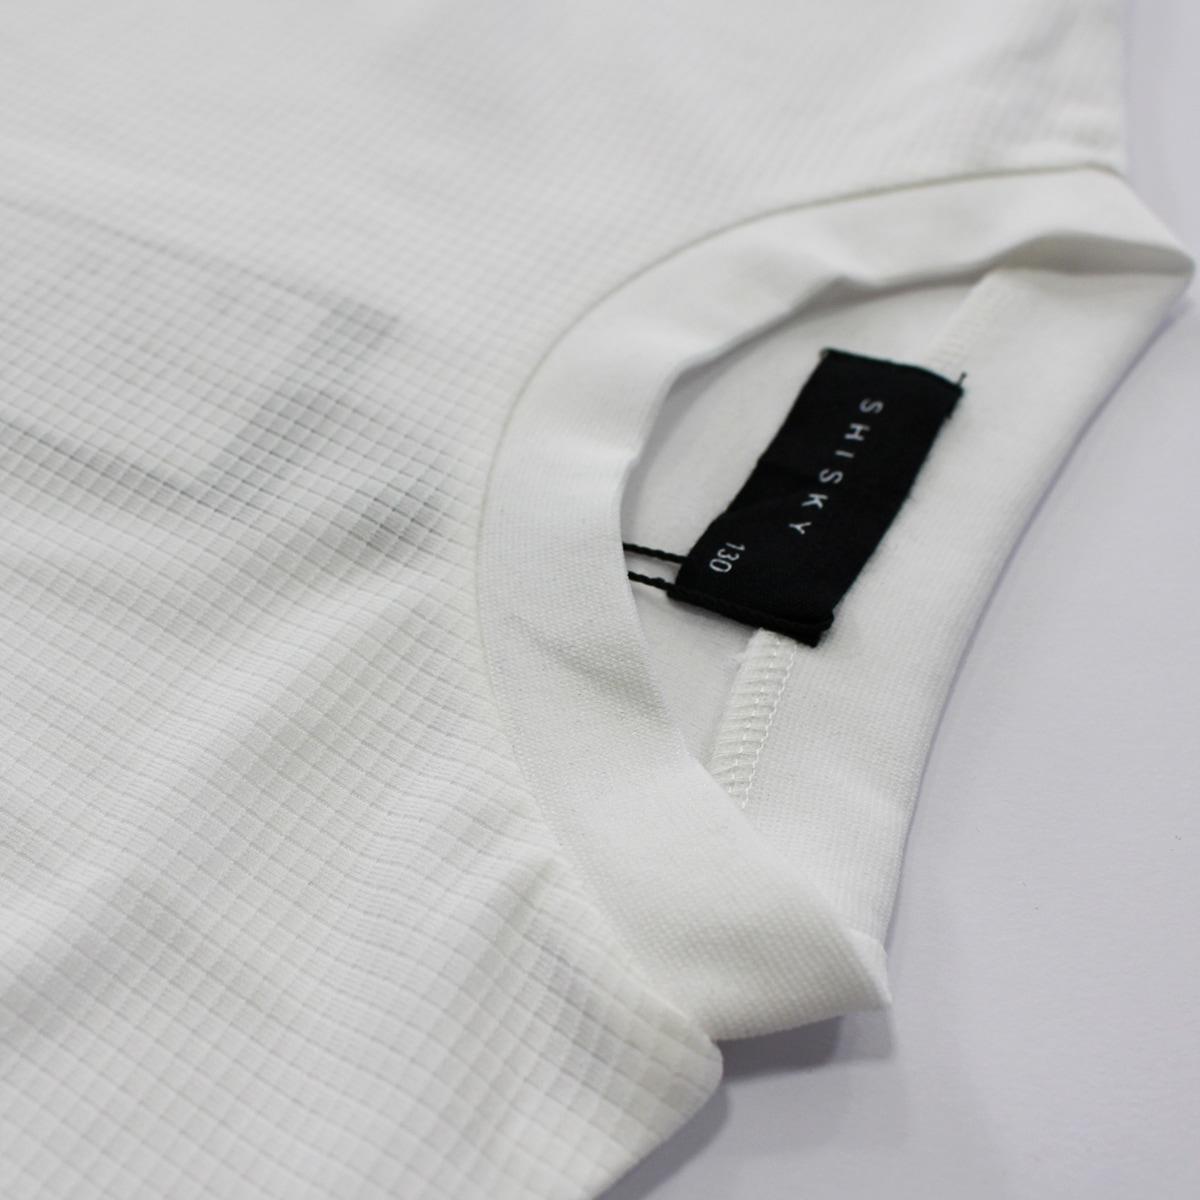 SHISKYワッフル素材半袖Tシャツ×レギンスセットアップ トップス ワッフル生地